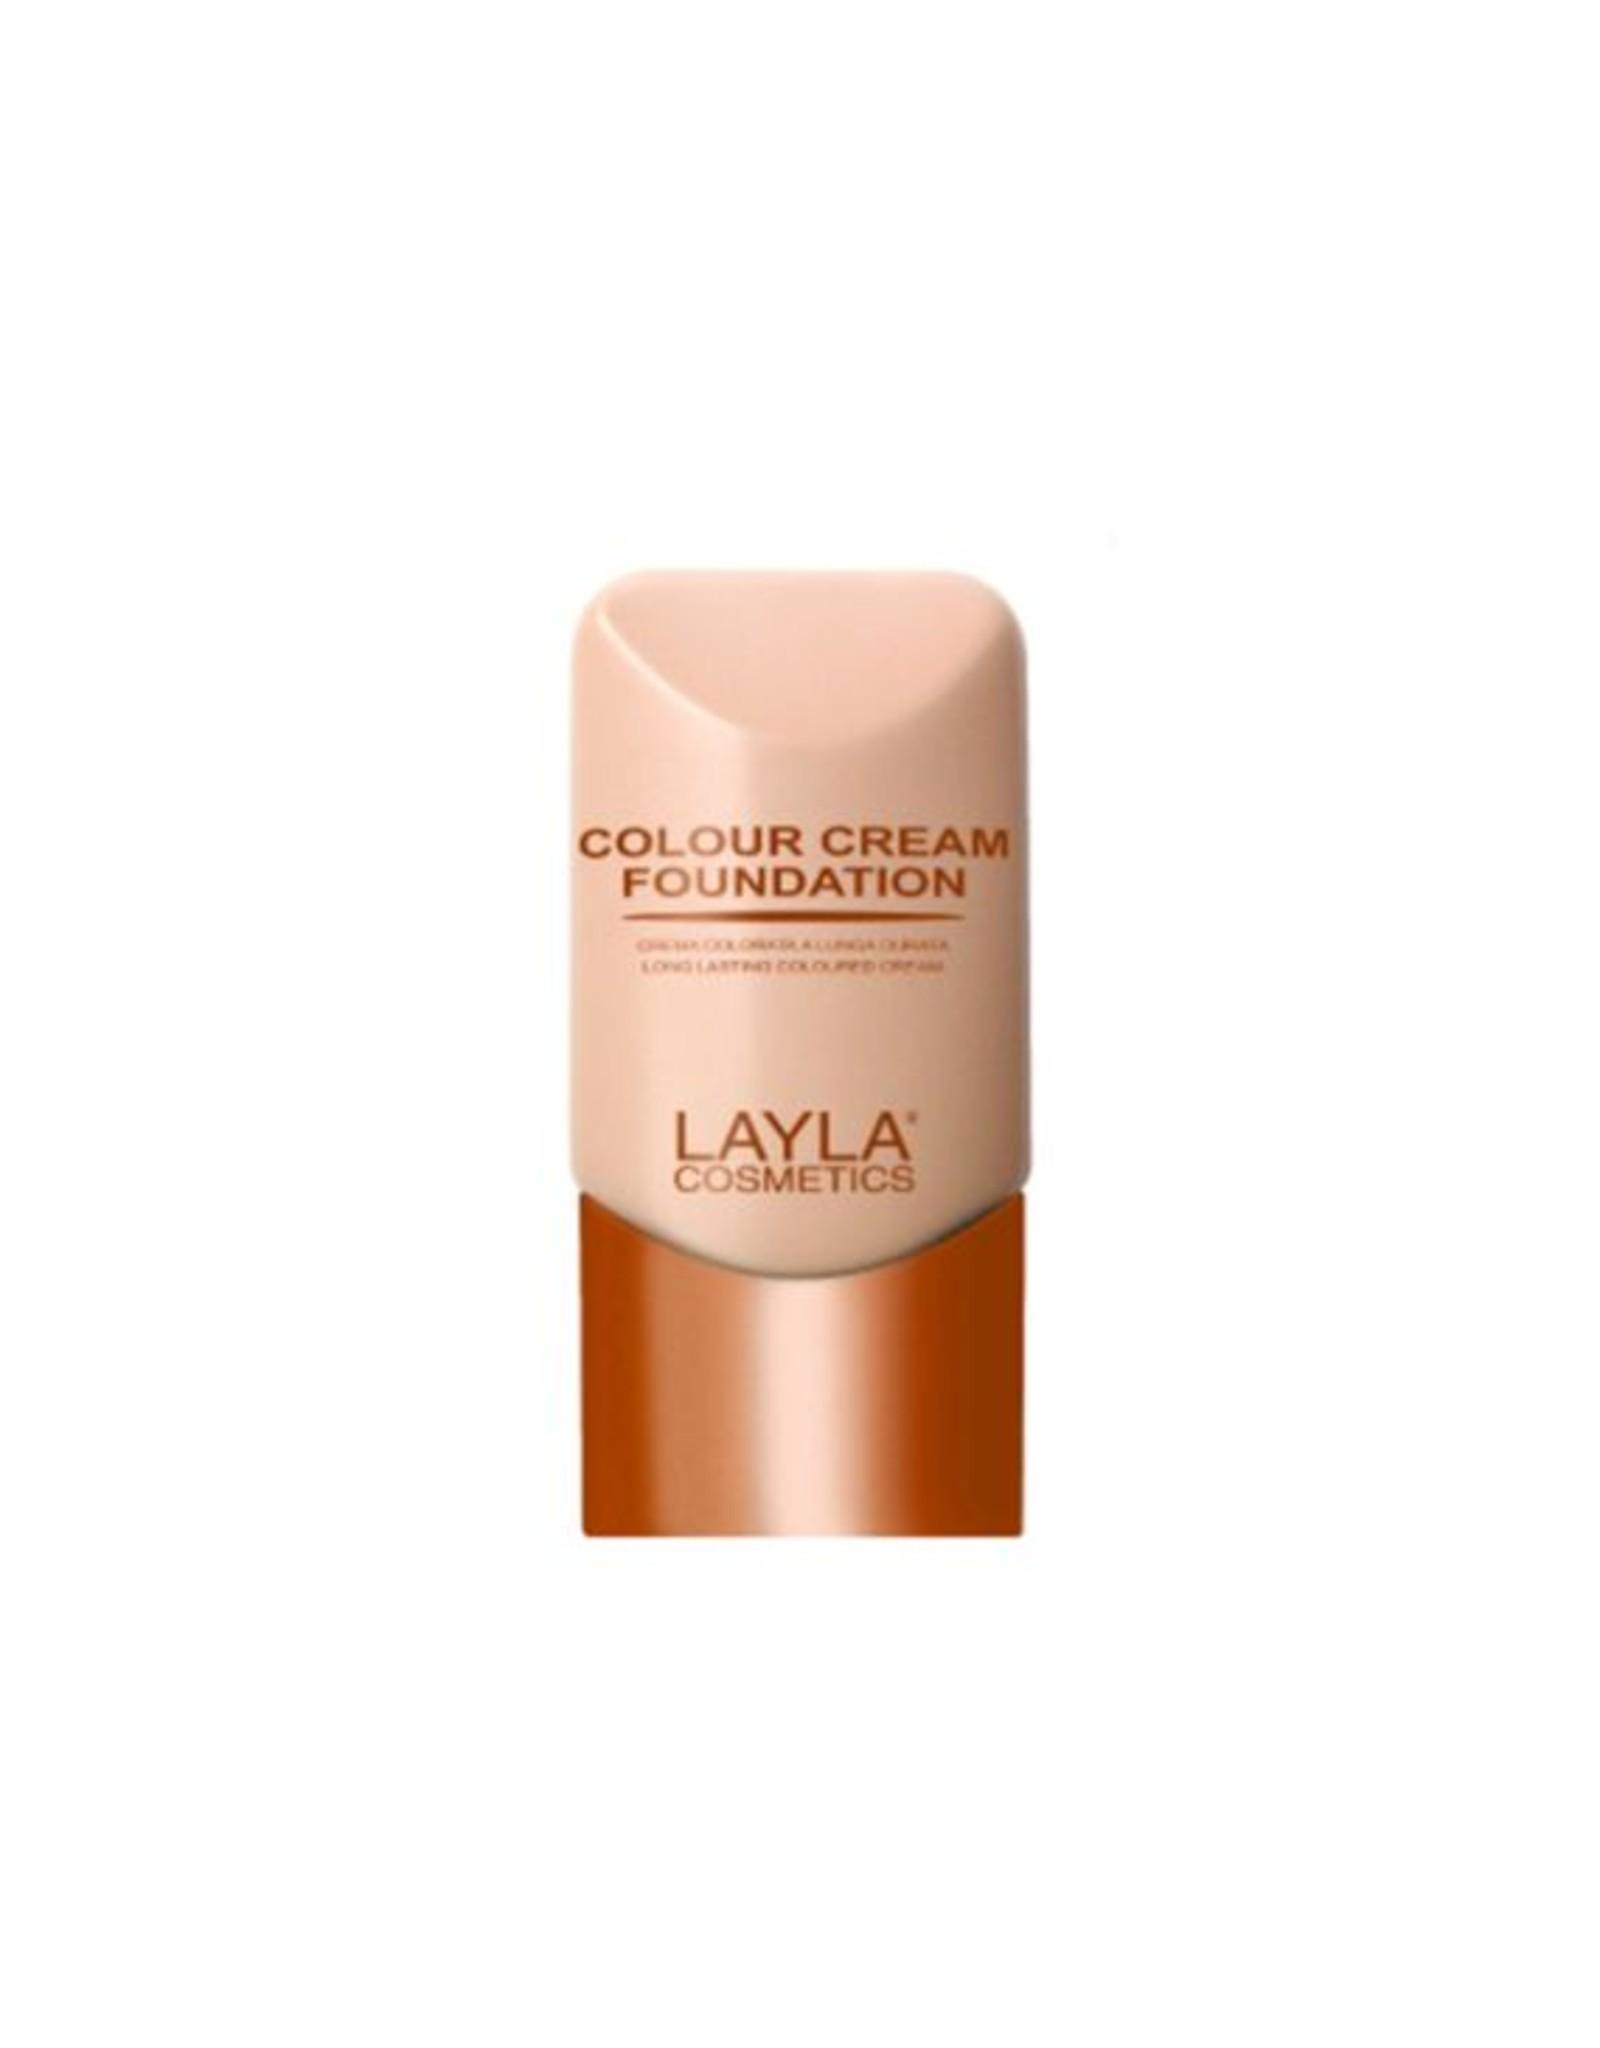 Layla Cosmetics Color Cream Foundation N°3 - Layla Cosmetics